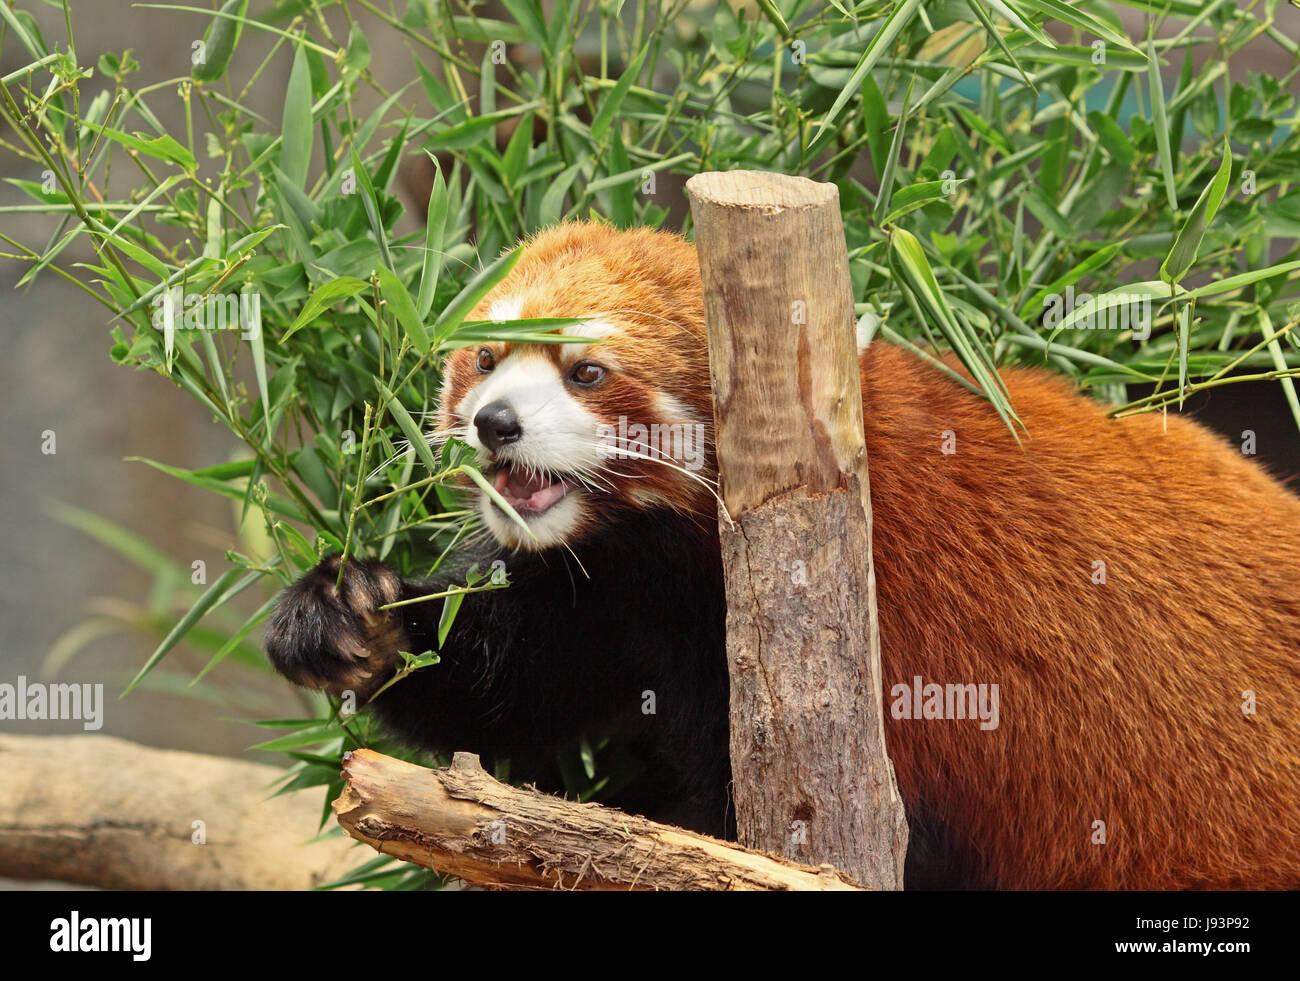 Blatt Tier Bambus Panda Essen Essen Isst Rot Wald Blatt